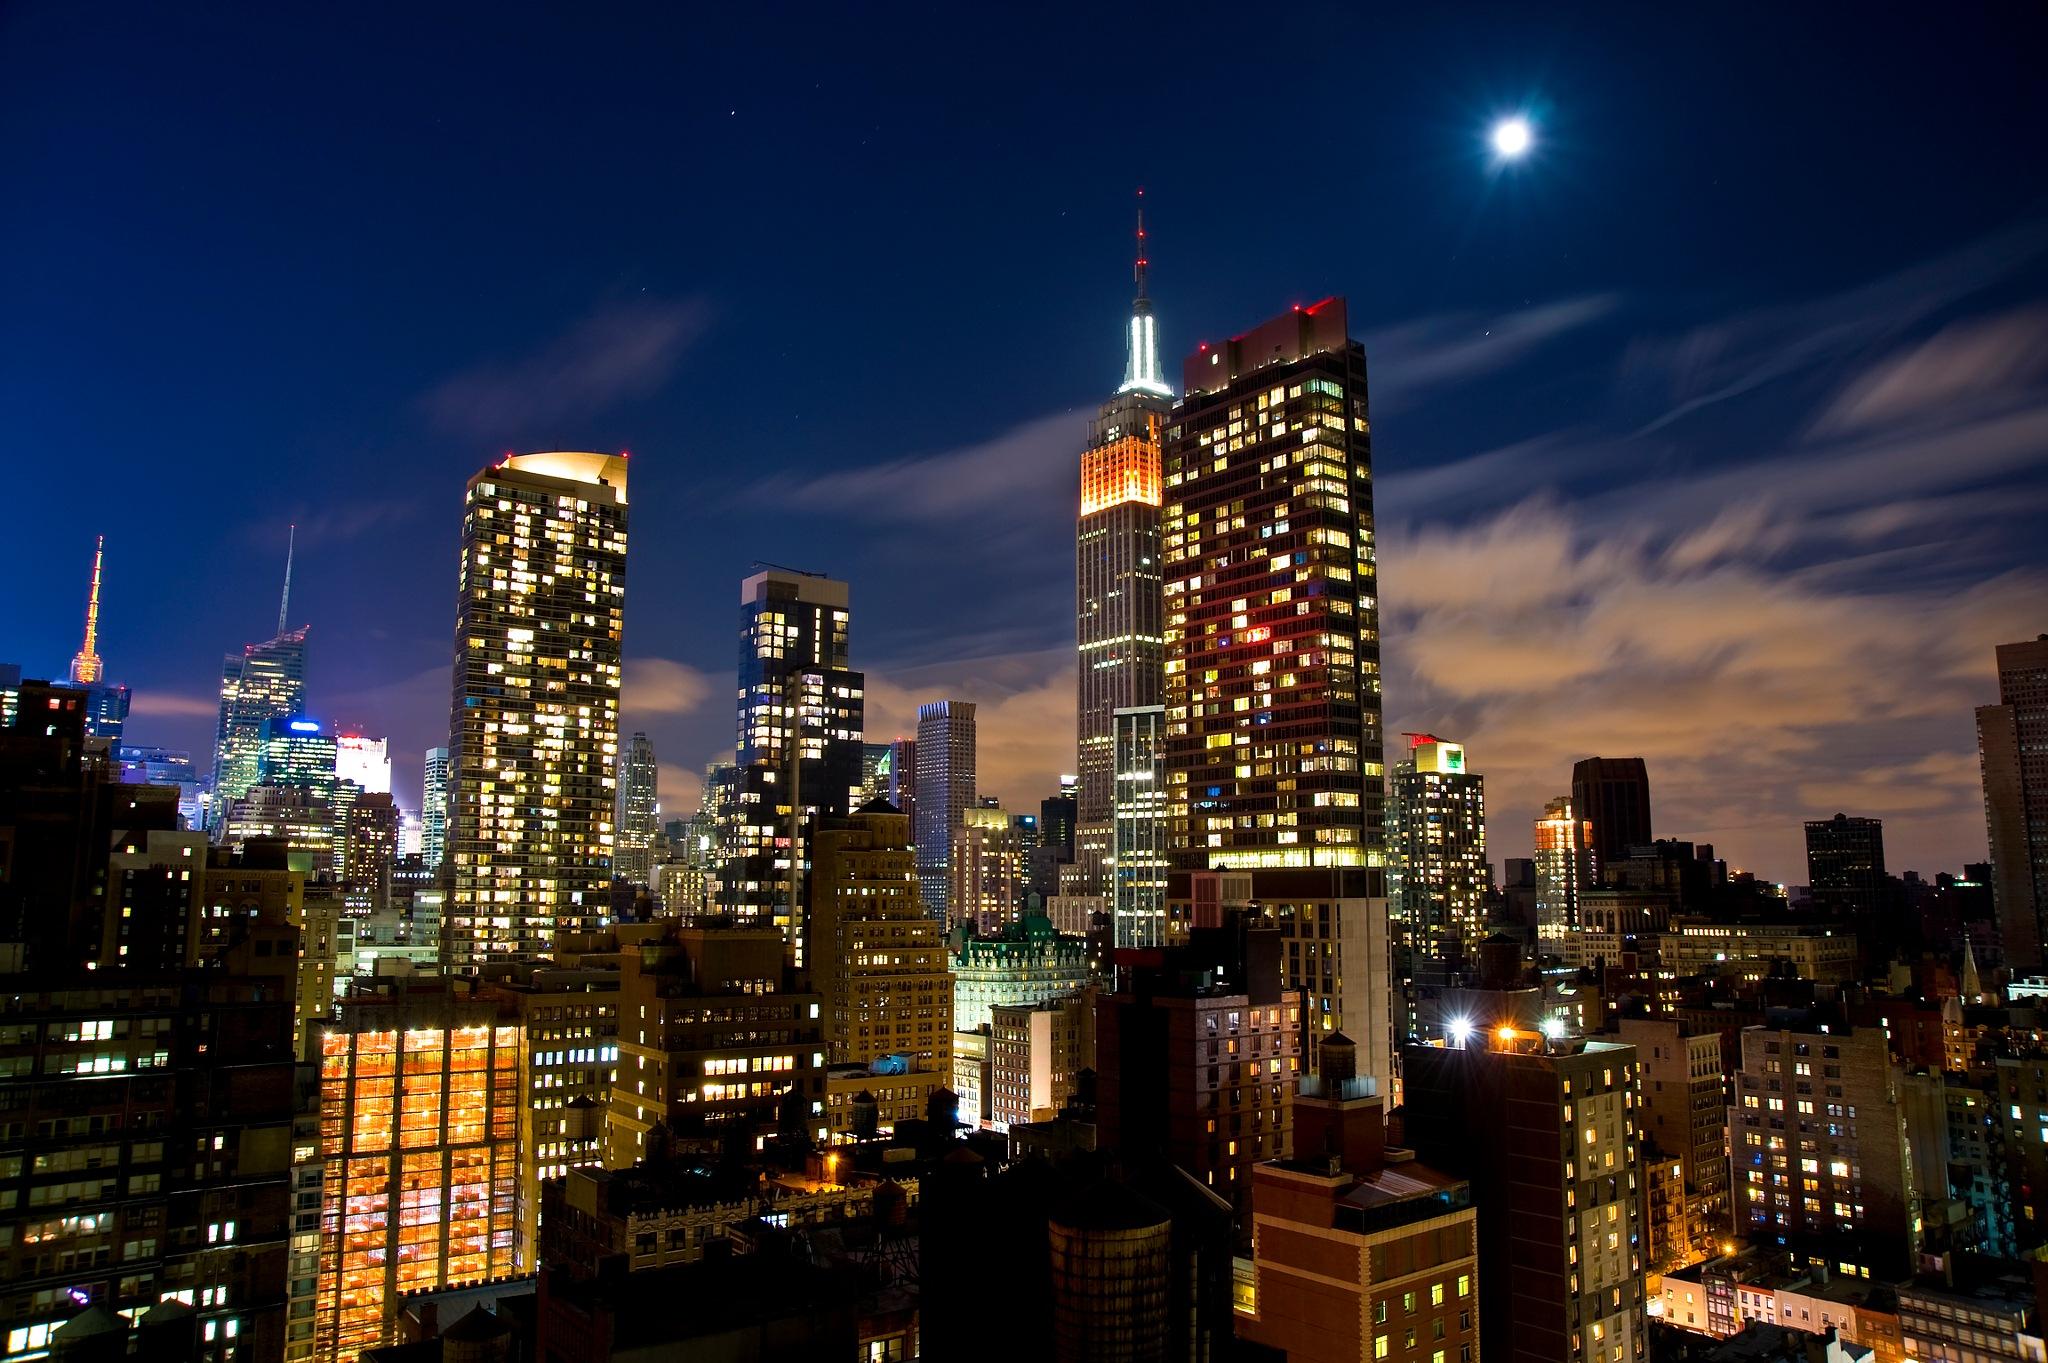 Moon Over Empire by Collitonstudio